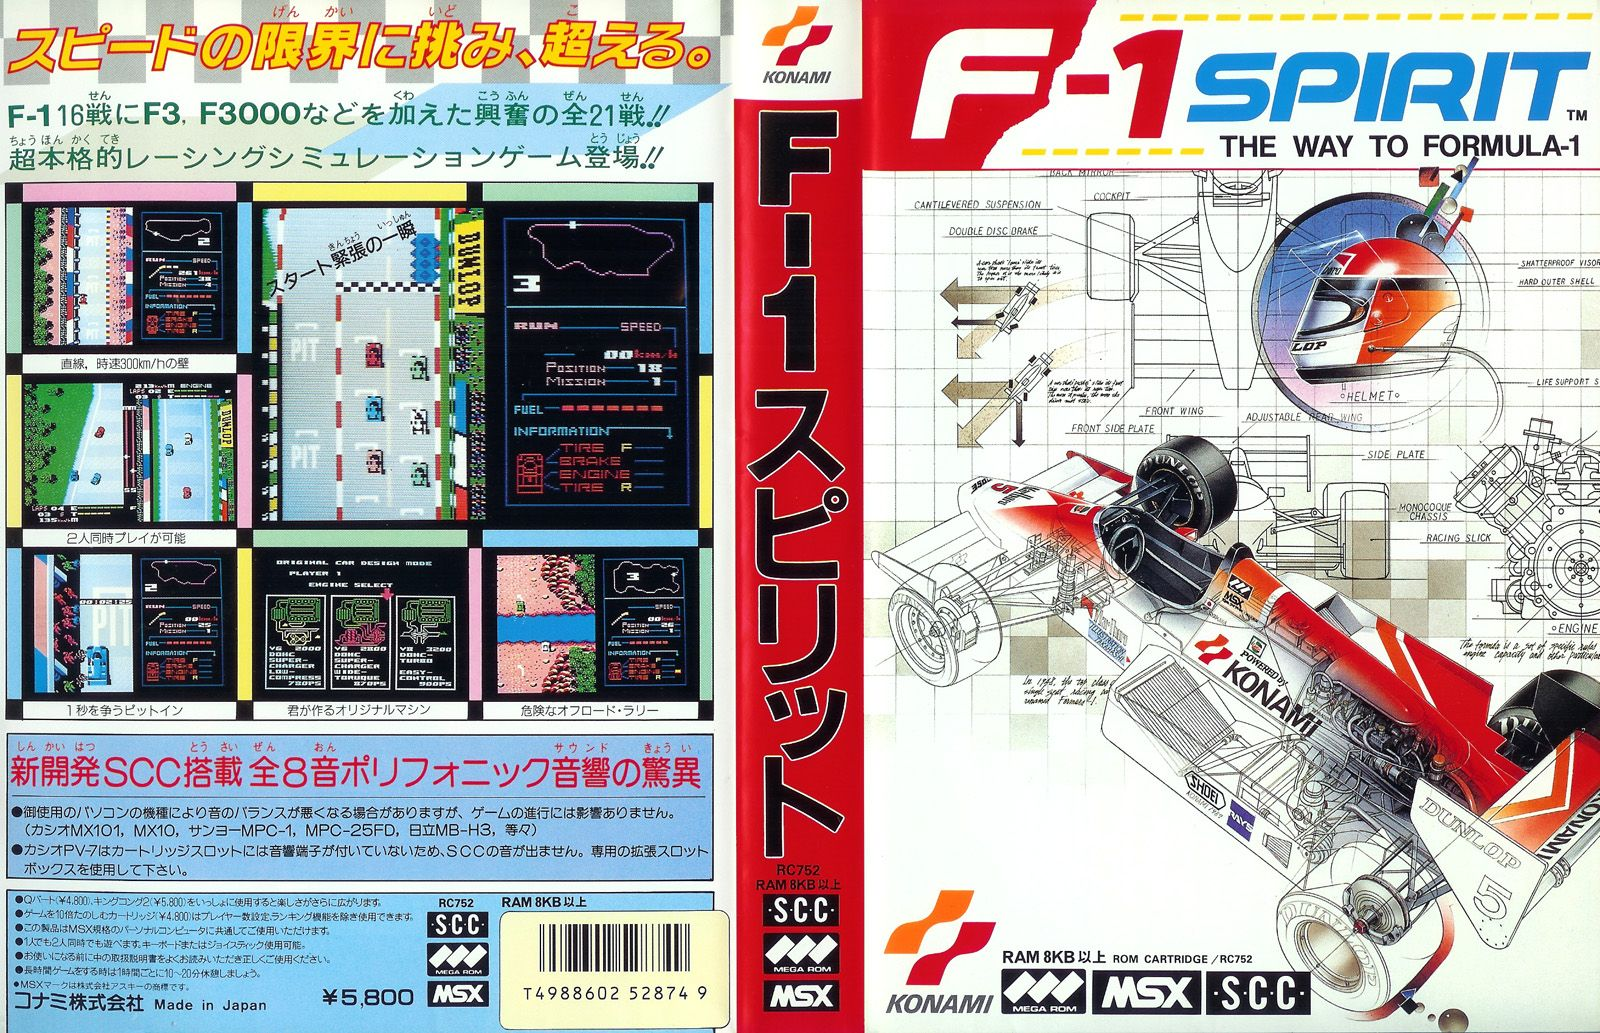 f674f4ed0b79b64dd8a47c9c75a6e5e9.jpg